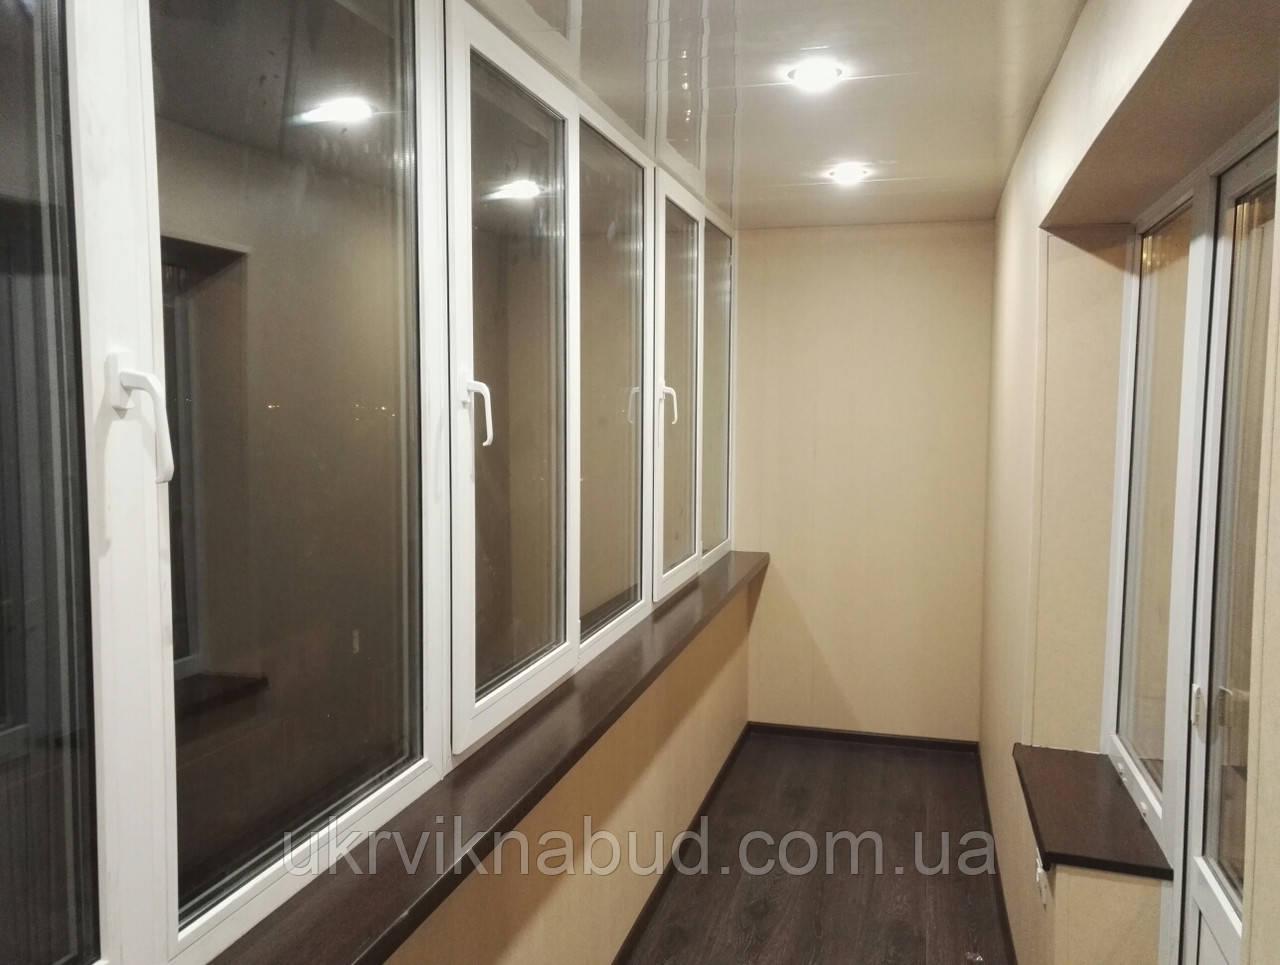 Внутренняя обшивка балконов цена Киев